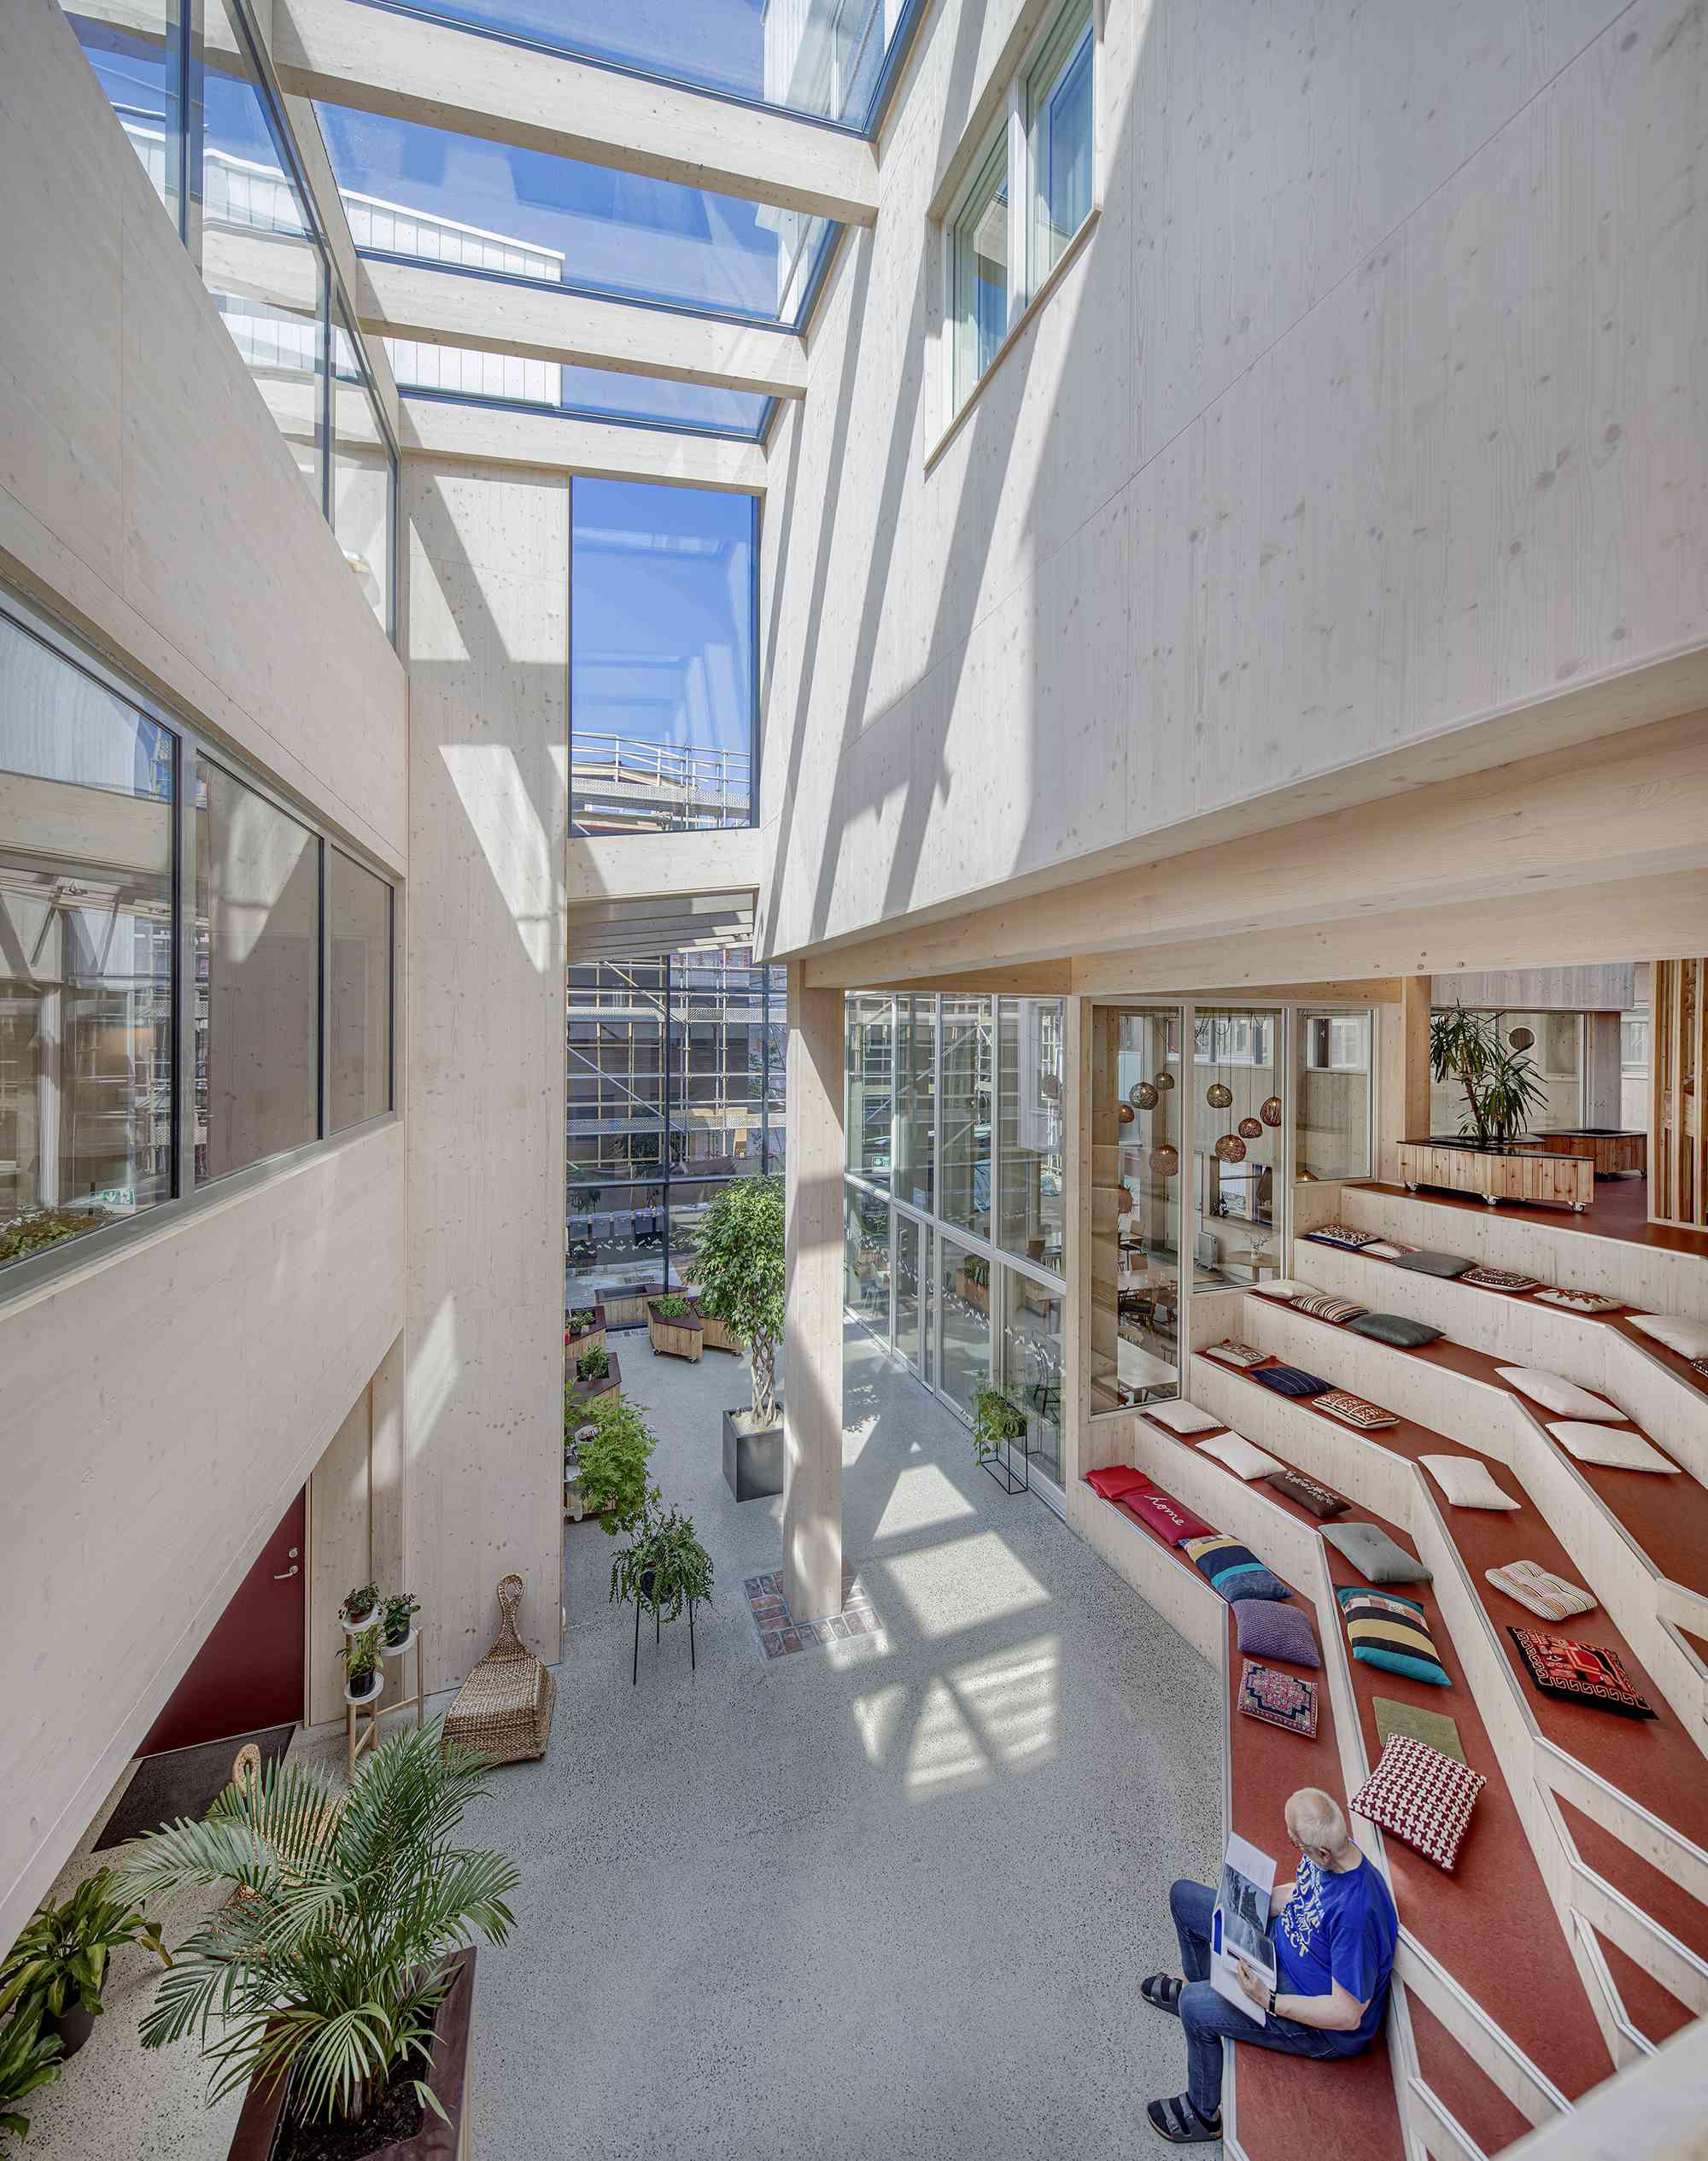 Vindmøllebakken Cohousing Project by Helen & Hard Architects interior courtyard